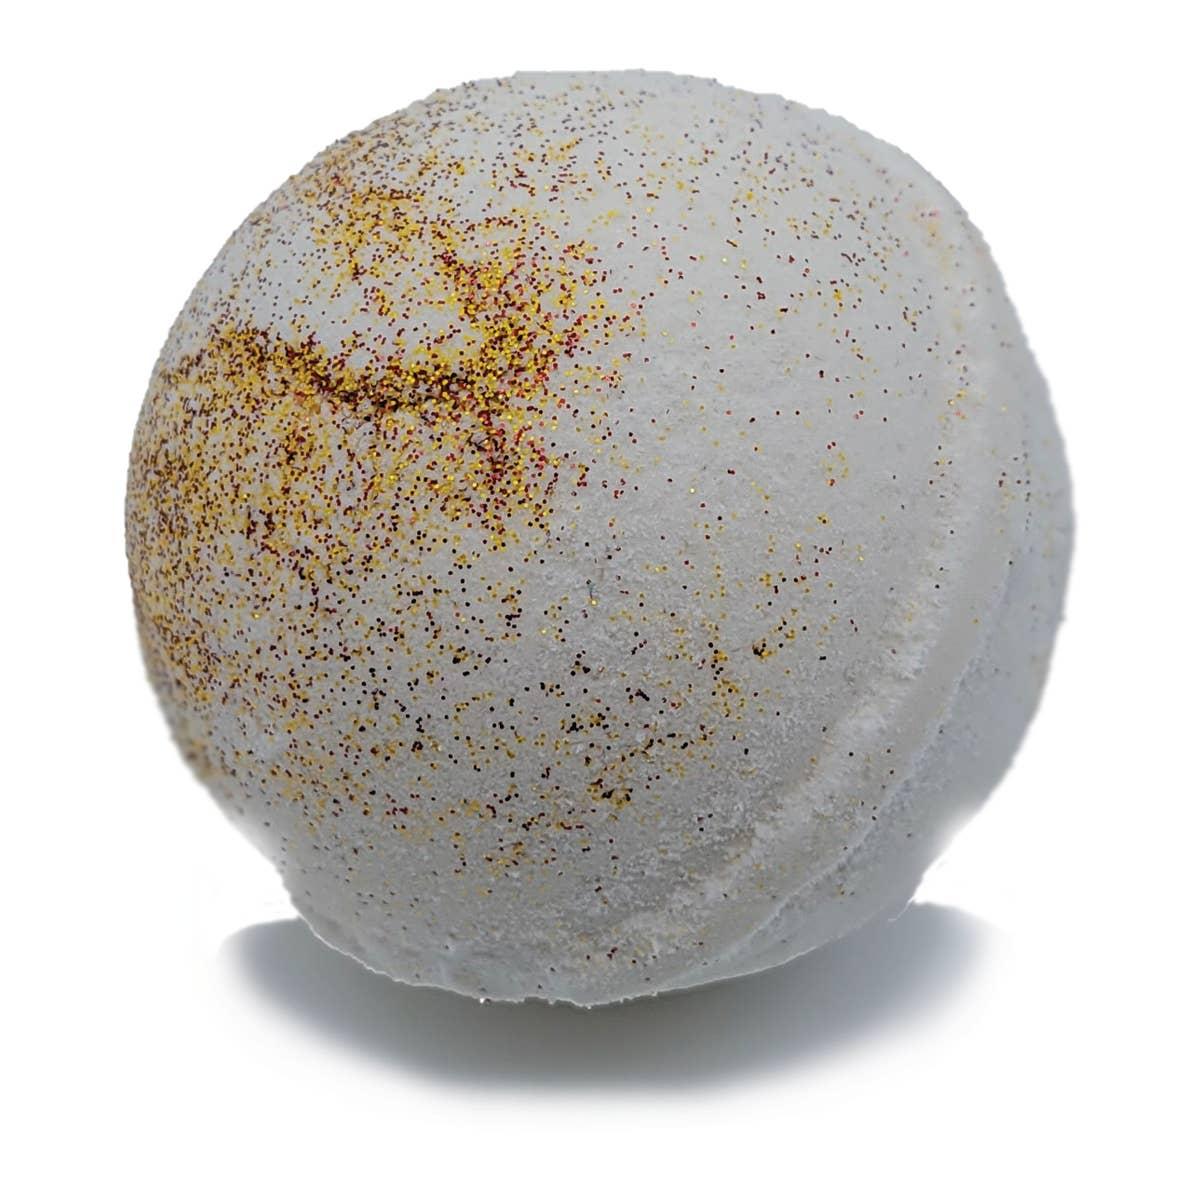 Evolve - Bath Bomb - Chakra Collection - Quartz | Trada Marketplace